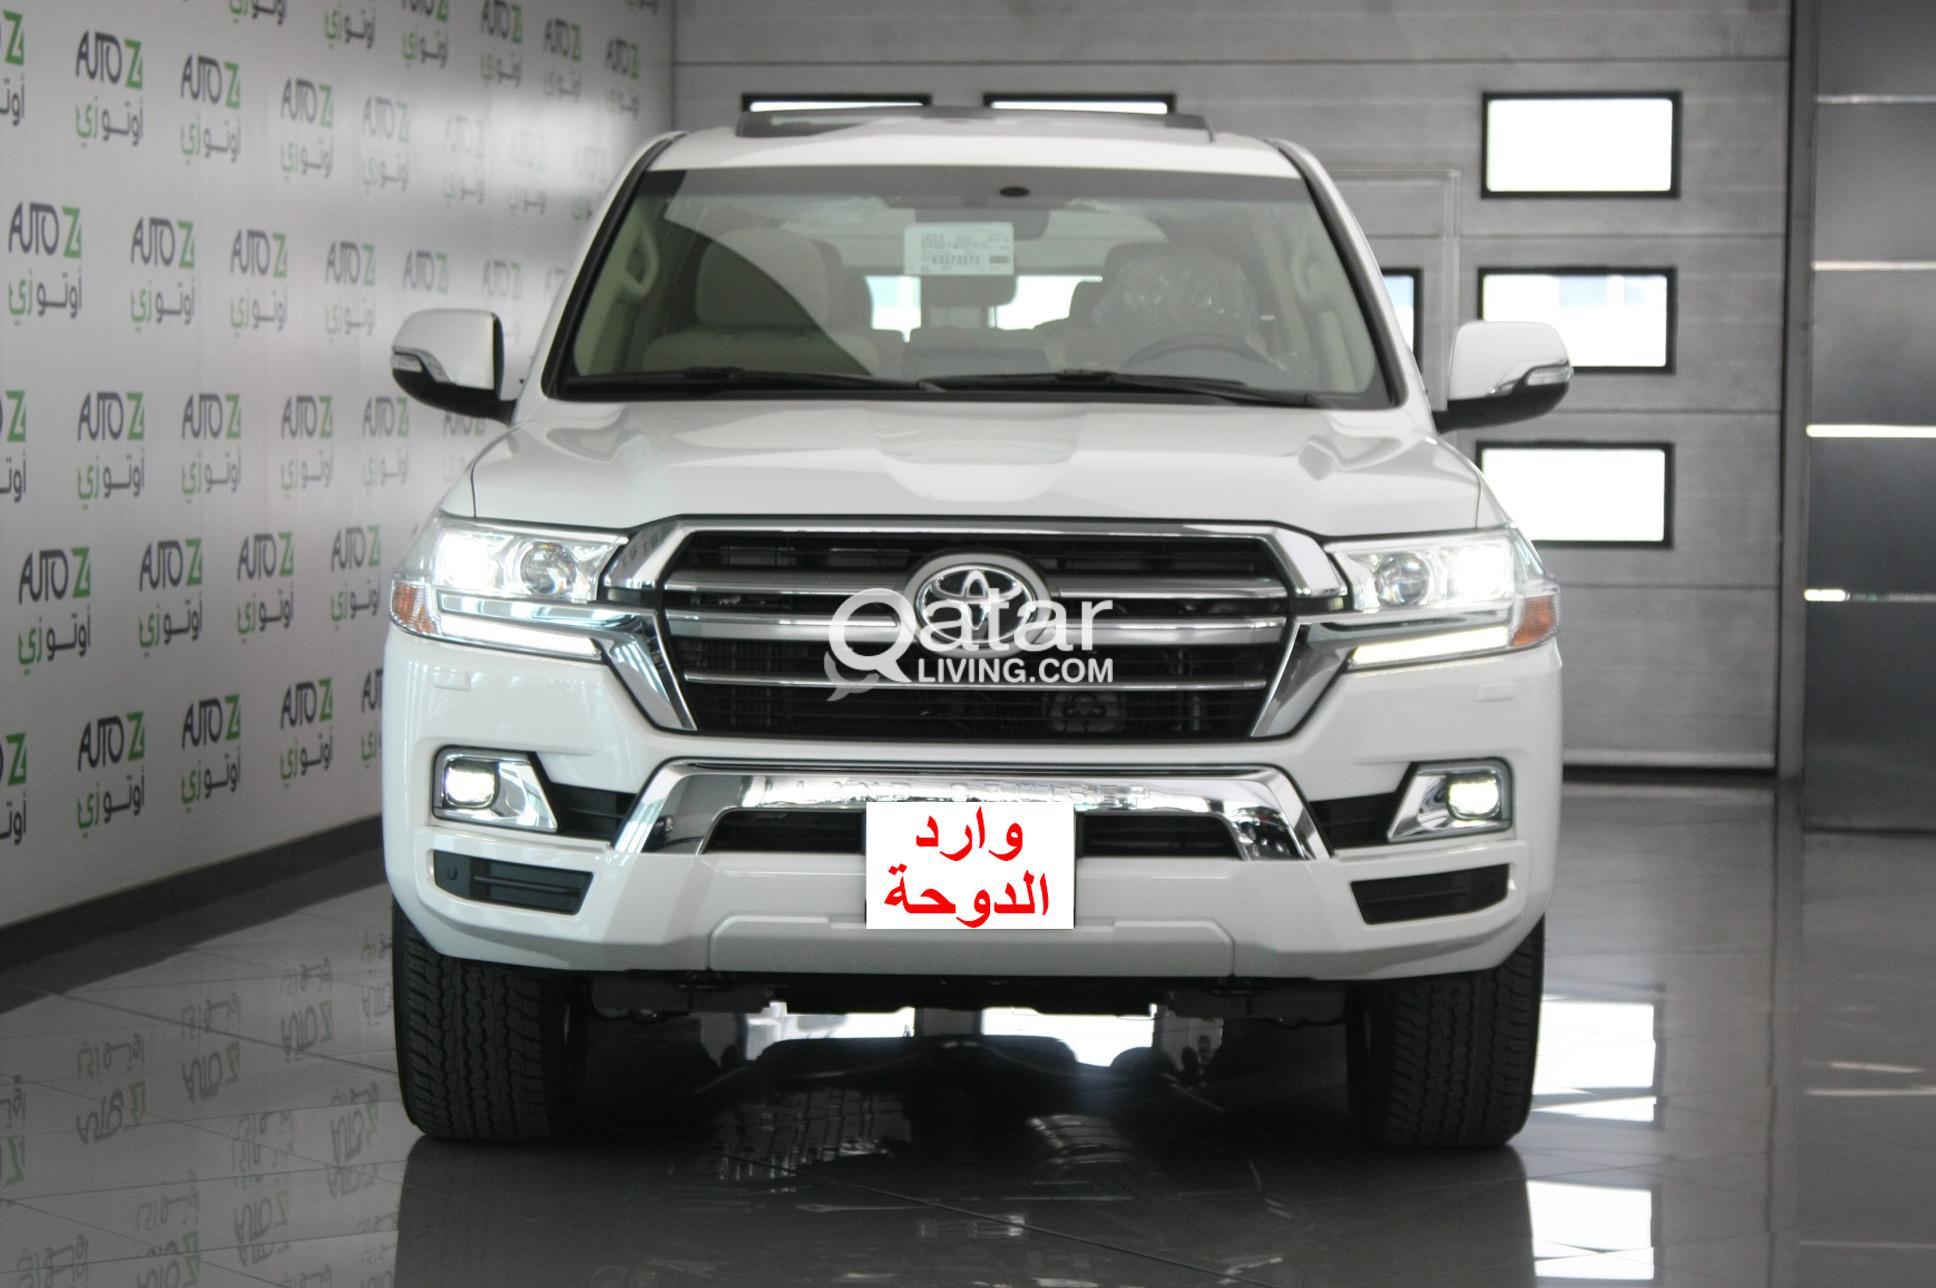 Toyota Land Cruiser Gxr White 2019 Qatar Living Ii Title